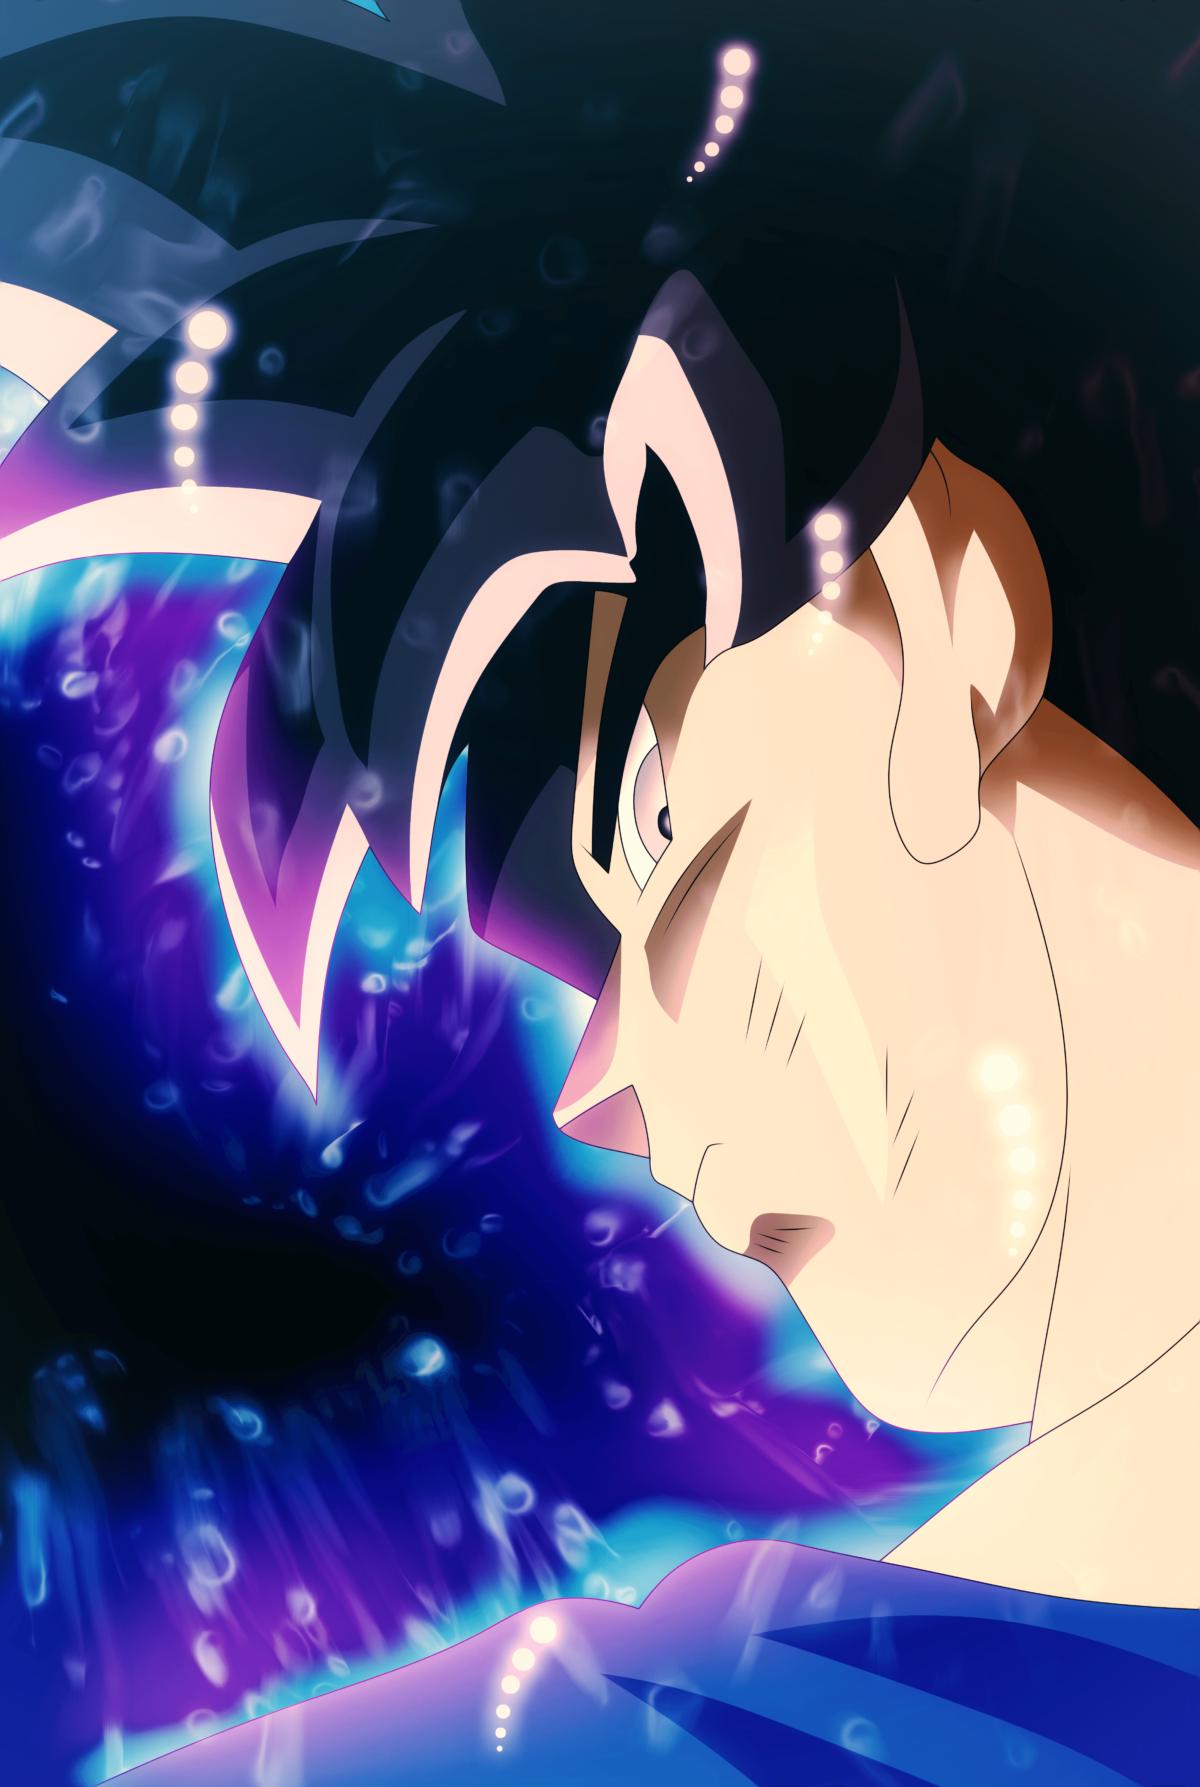 Ultra Instinct Goku Art – ID: 110195 – Art Abyss